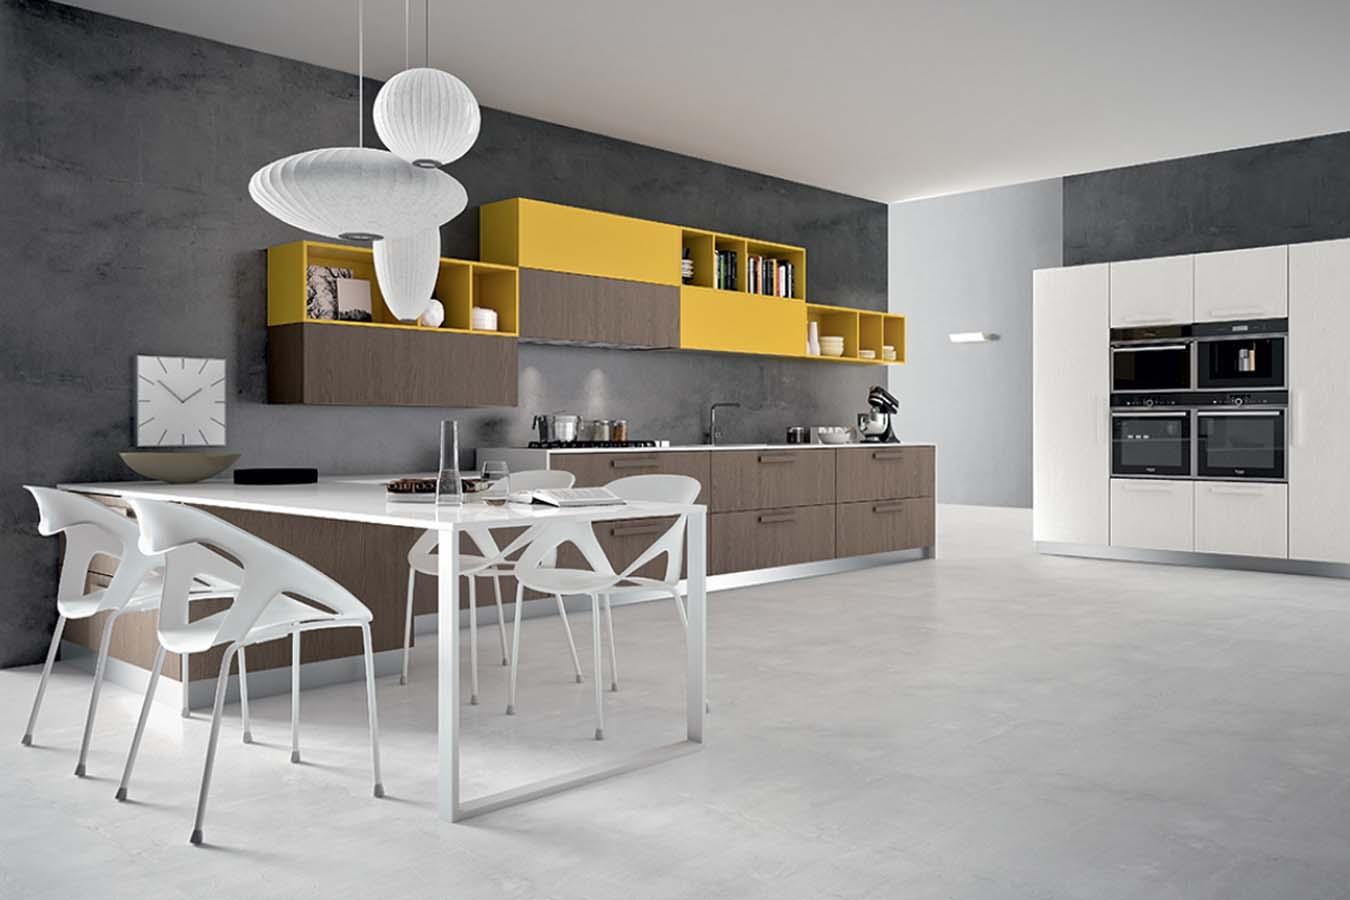 Cucina moderna Pentha di Arredo3 in frassino naturale e giallo